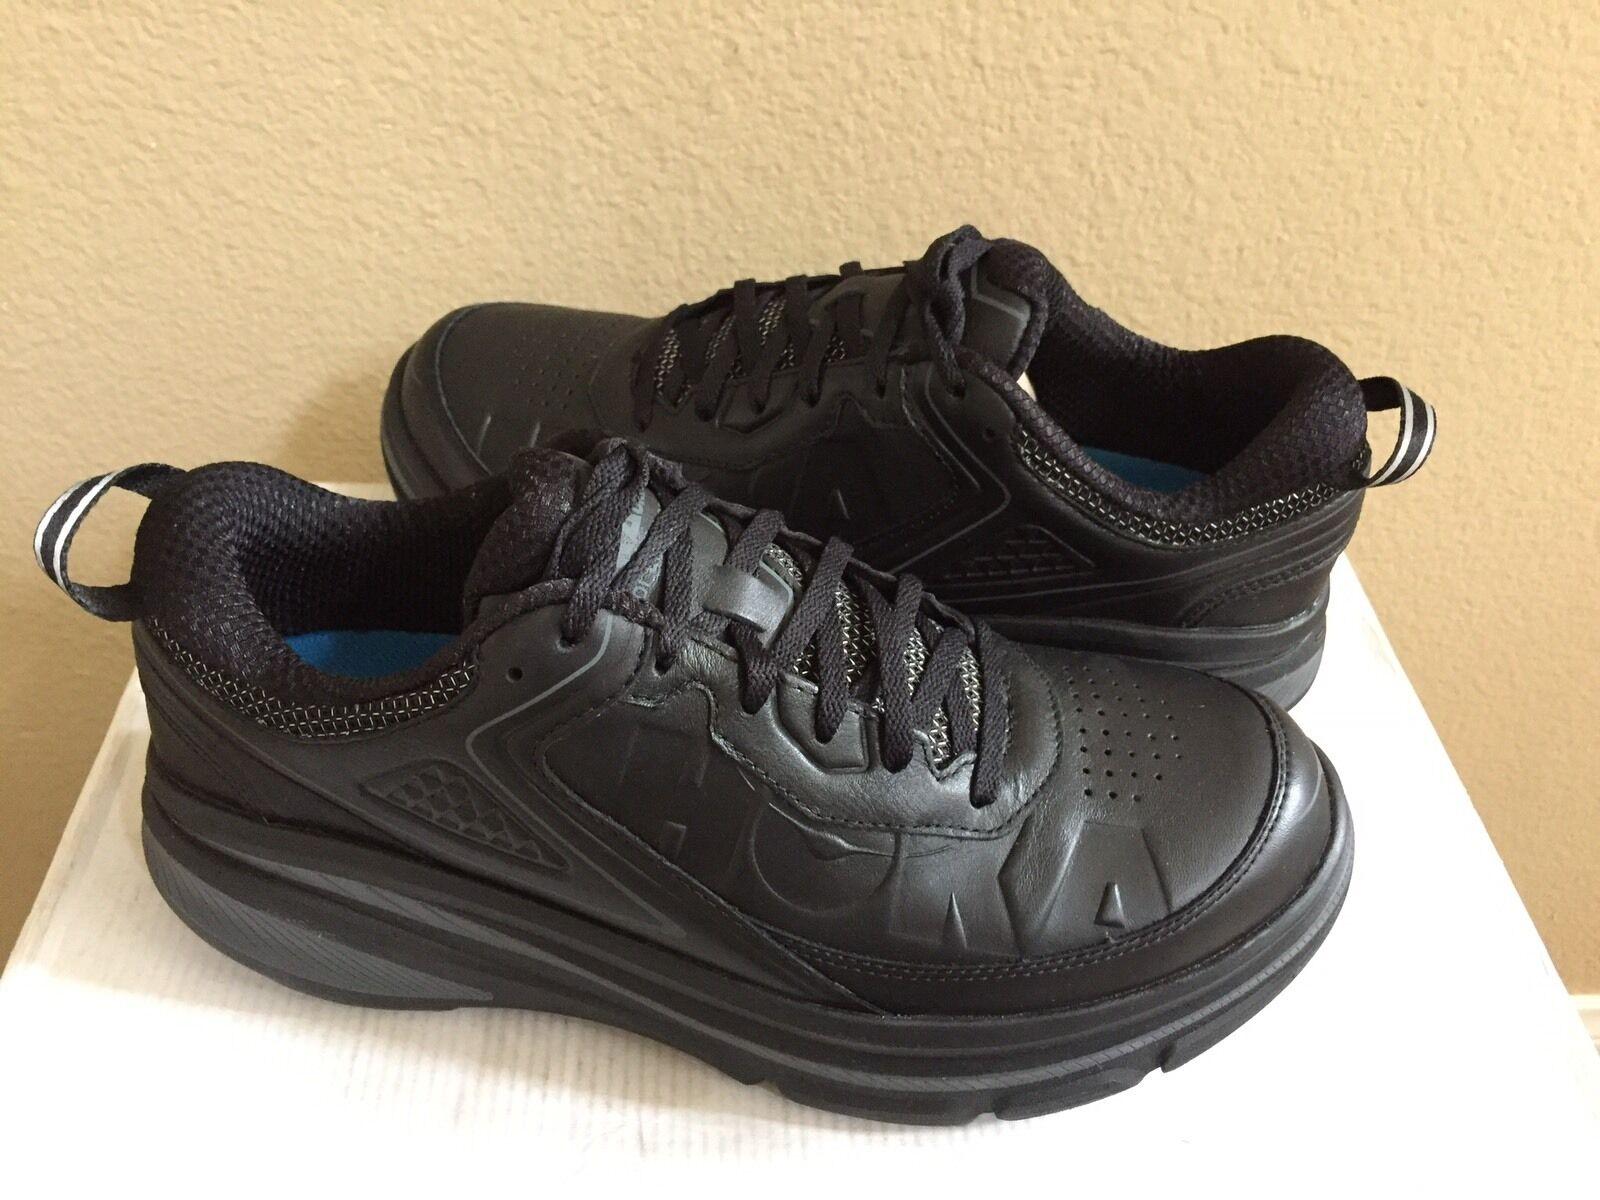 Hoka one one one one mujer Bondi Ltr Negro Running zapatos US 7 EU 38 2 3 UK 5.5  en venta en línea